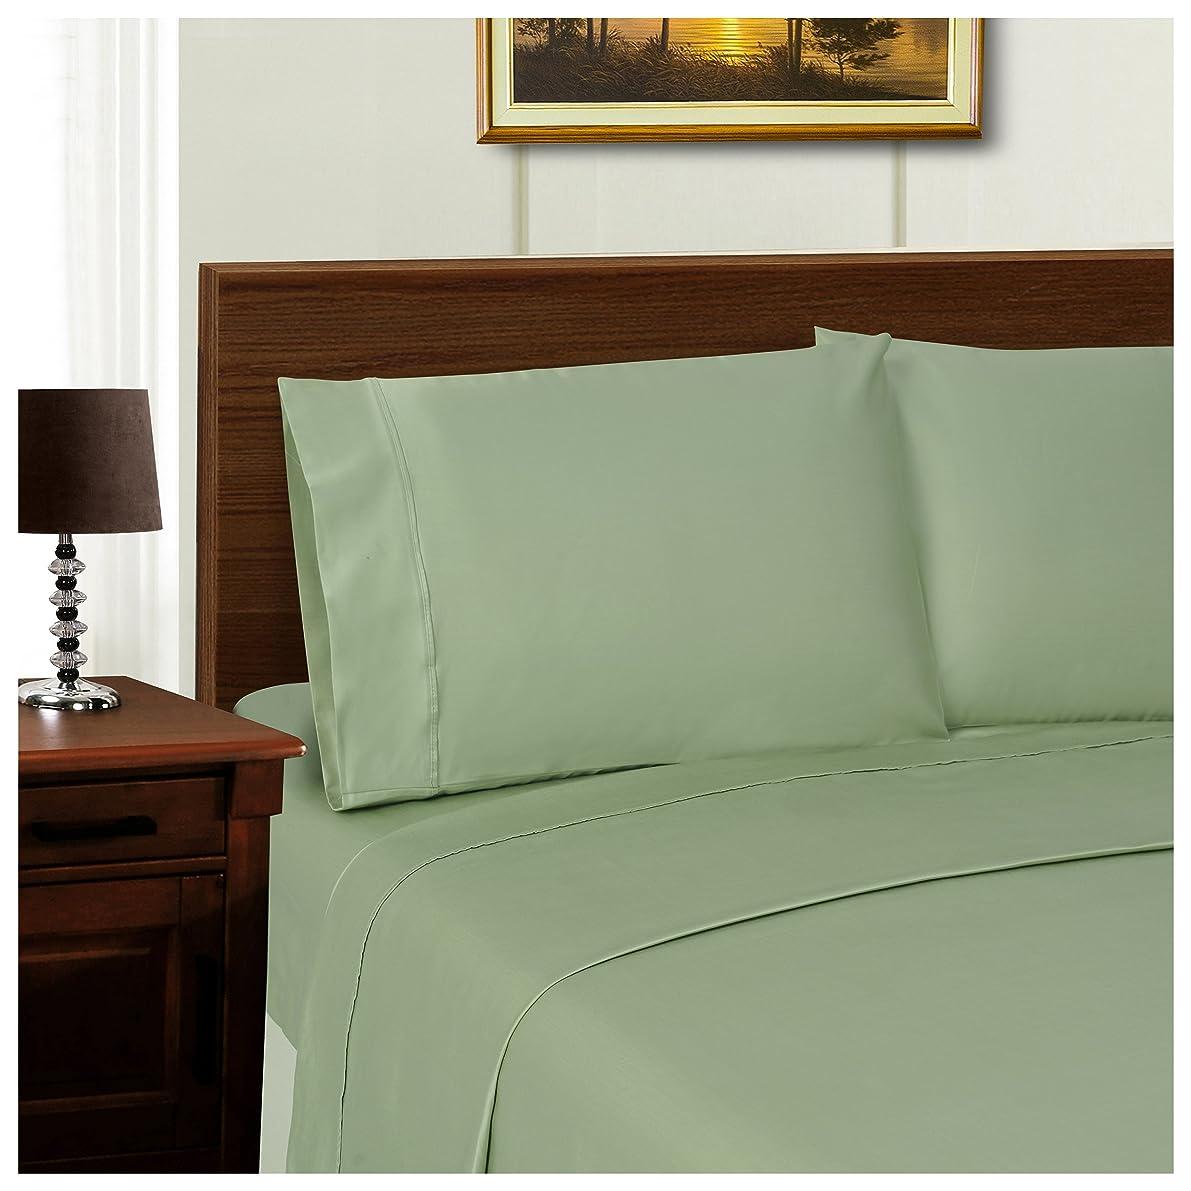 Superior TP1000KGPC SLSG, Cotton 1000 Thread count Envelope closure pillowcases, King, Sage, 2 Piece